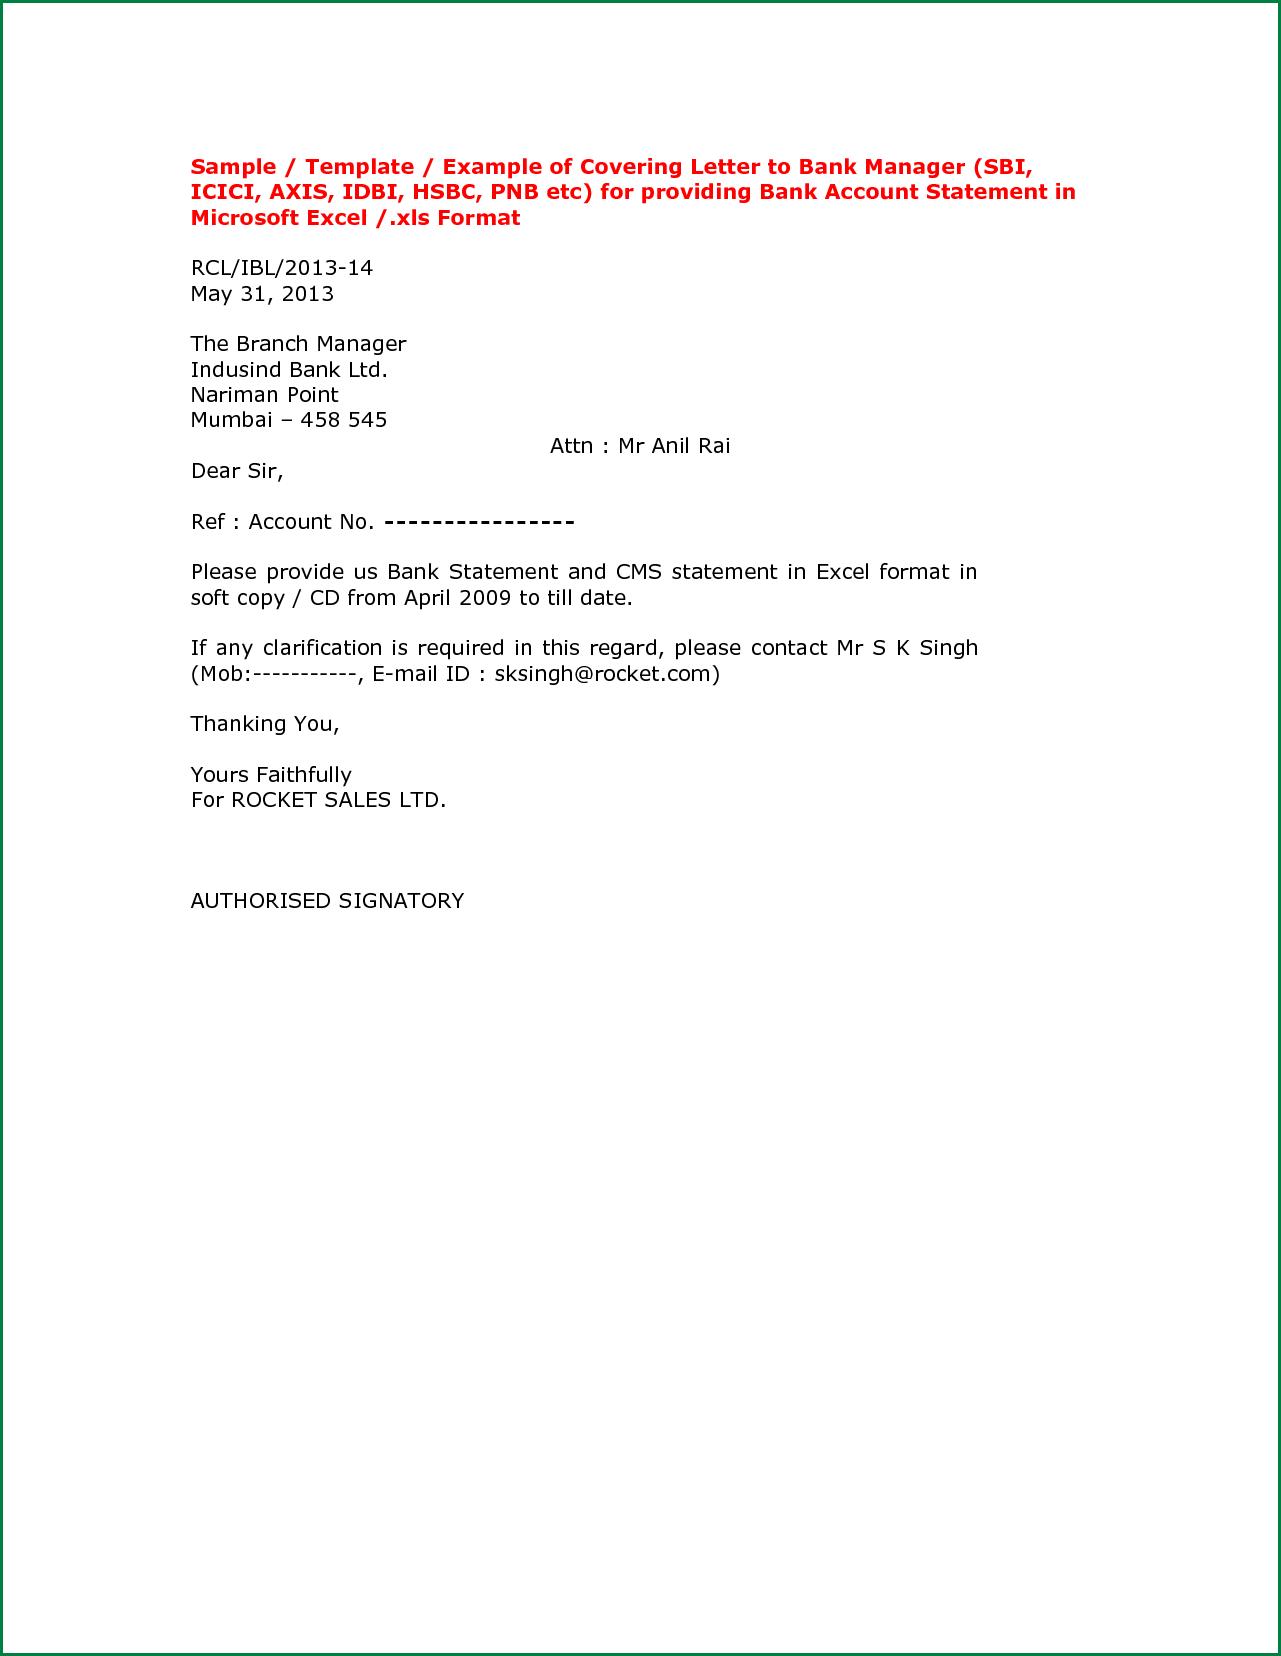 Application for bank statement format applicationsformatfo job application for bank statement format applicationsformatfo job letter basic appication spiritdancerdesigns Choice Image